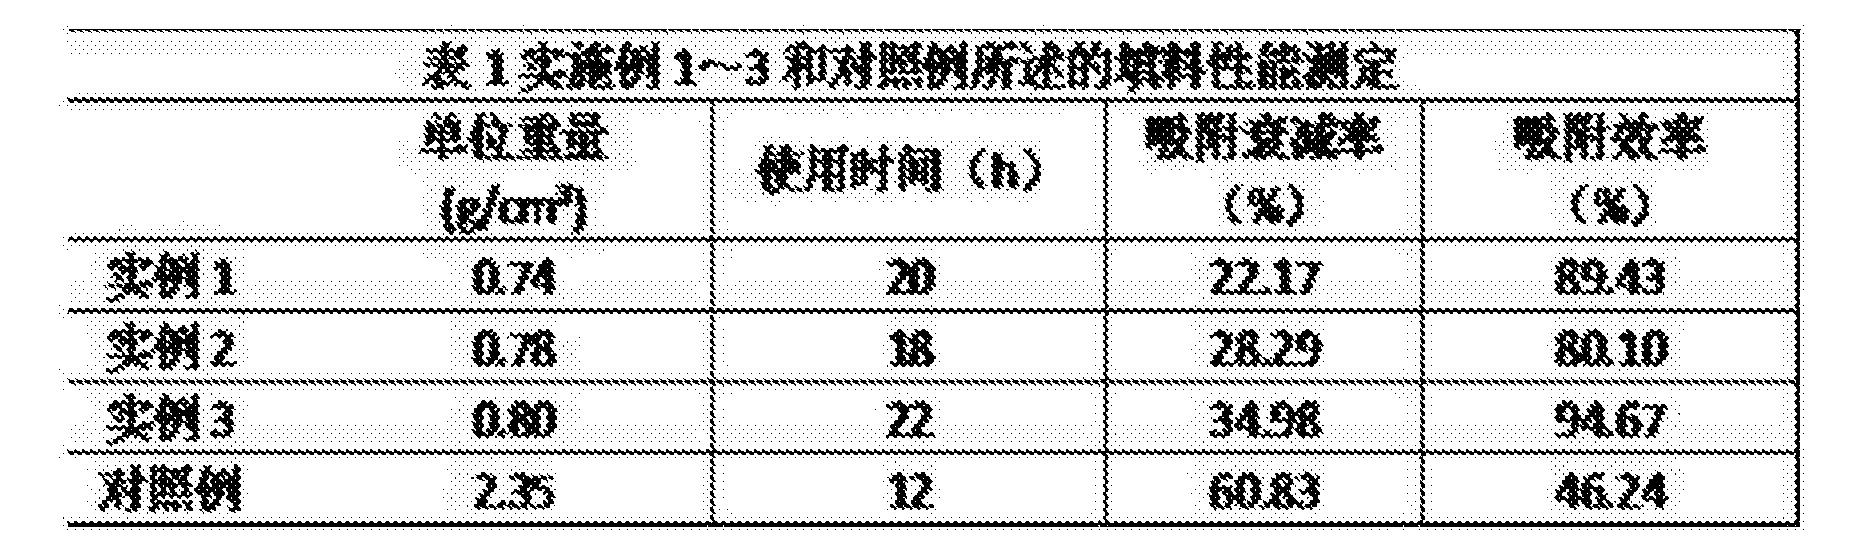 Figure CN105771596AD00101